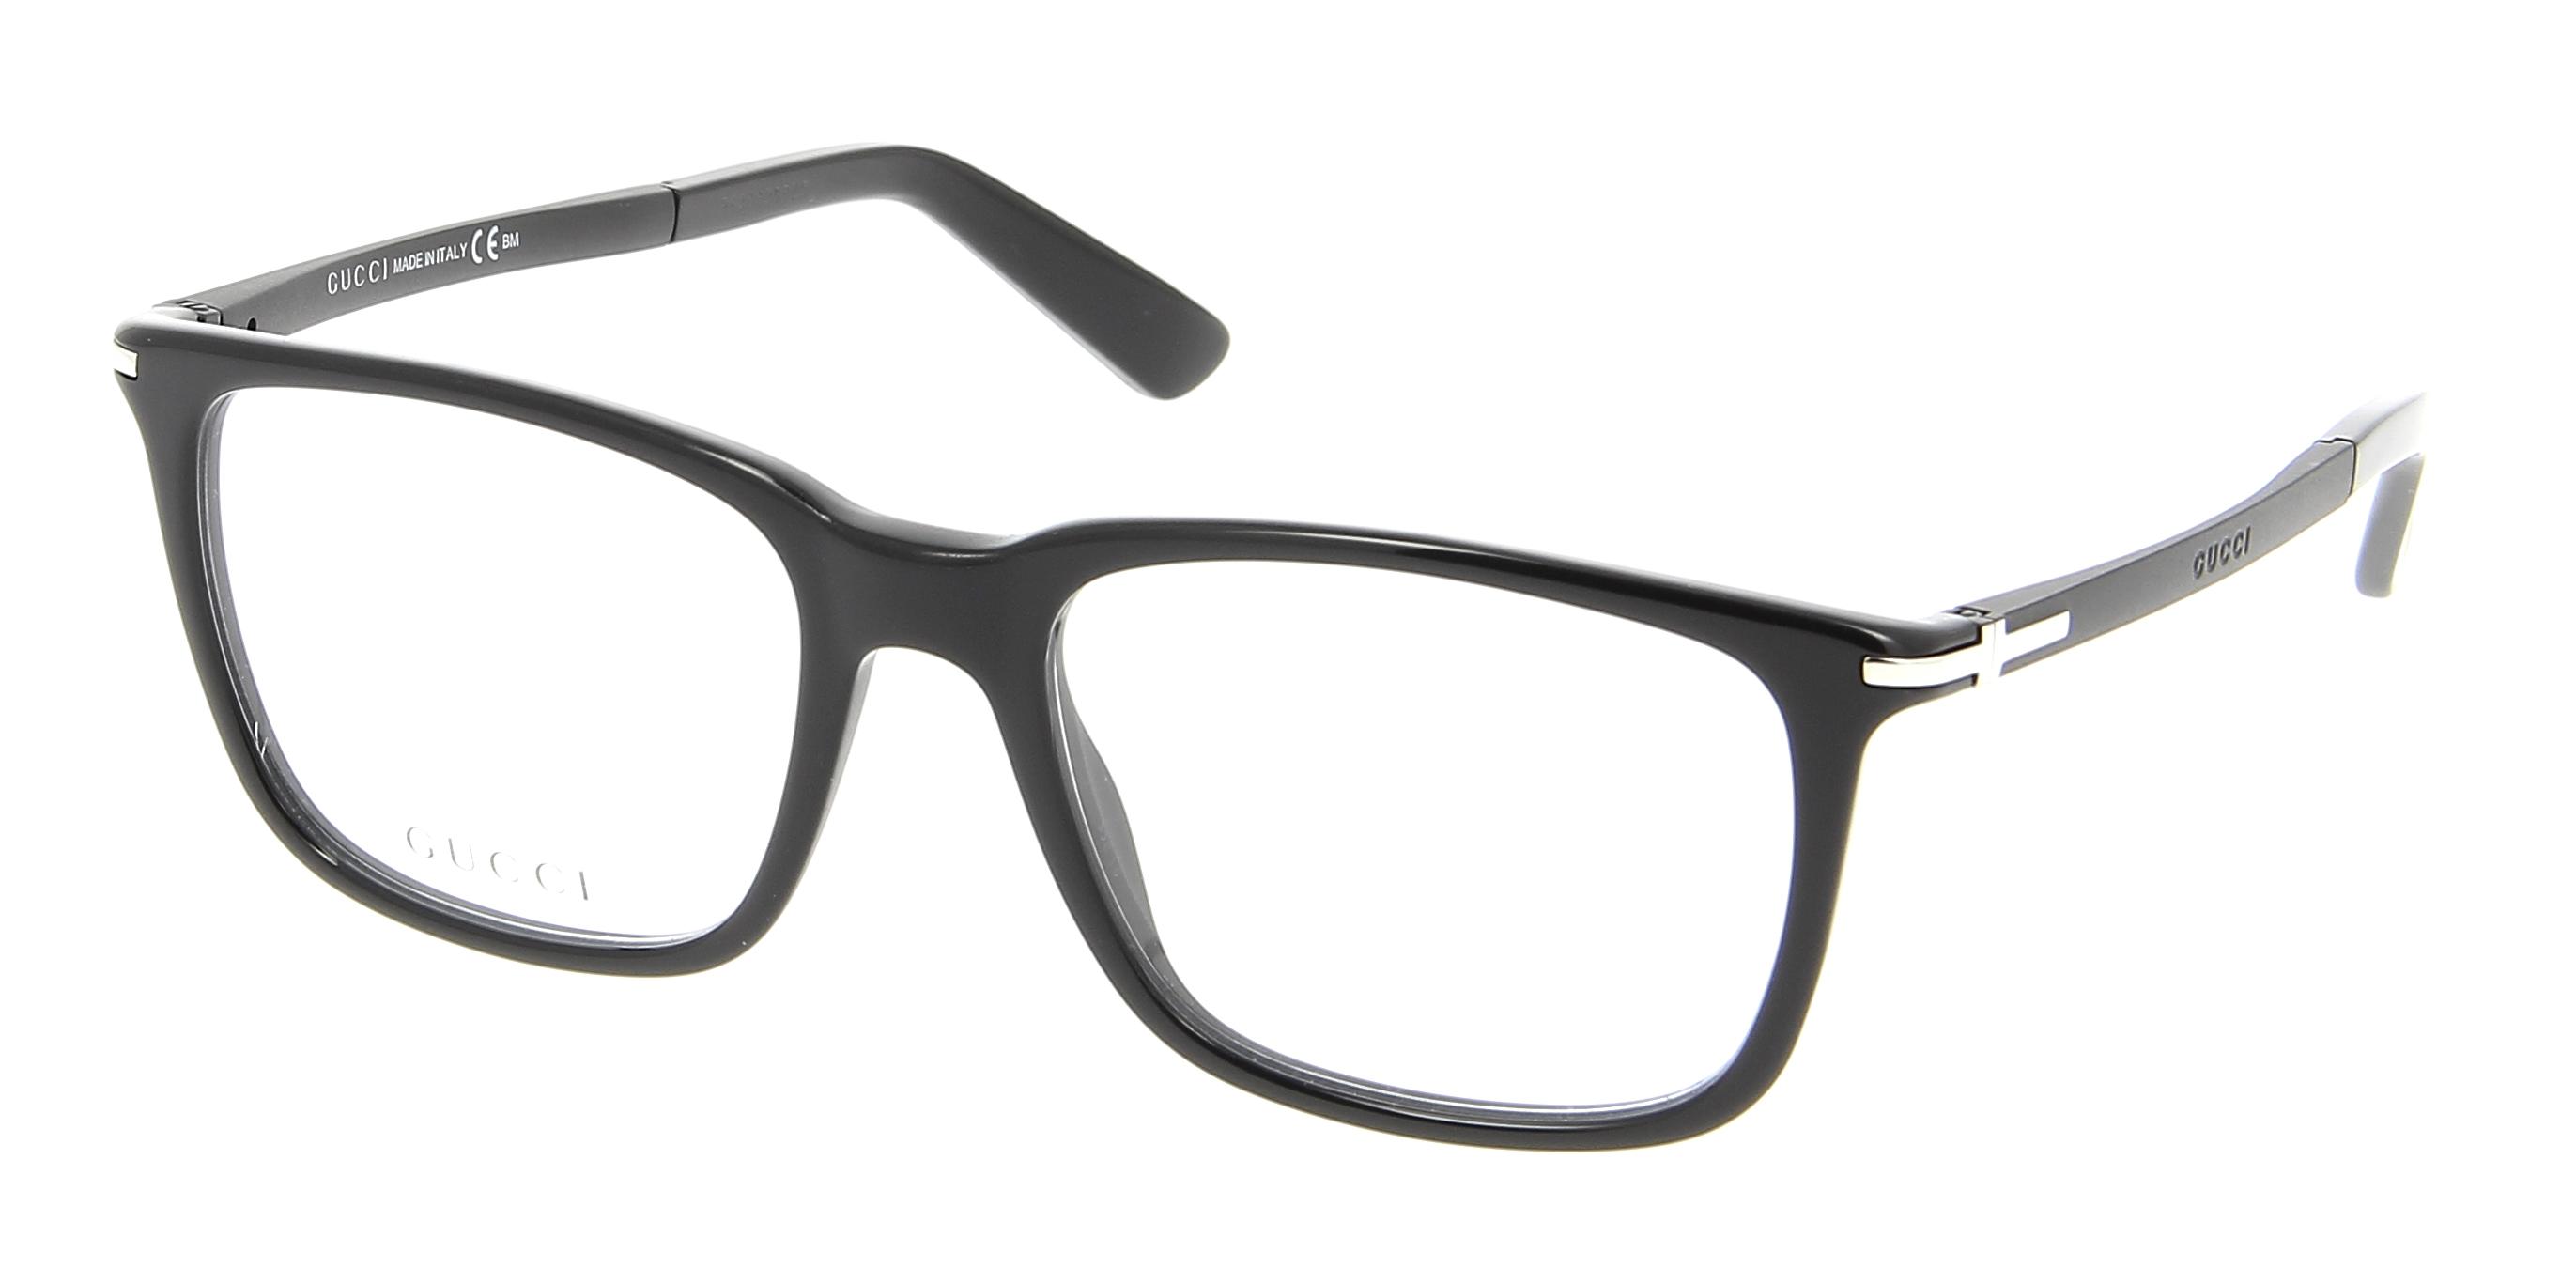 lunette gucci homme vue bfdf28b2340a